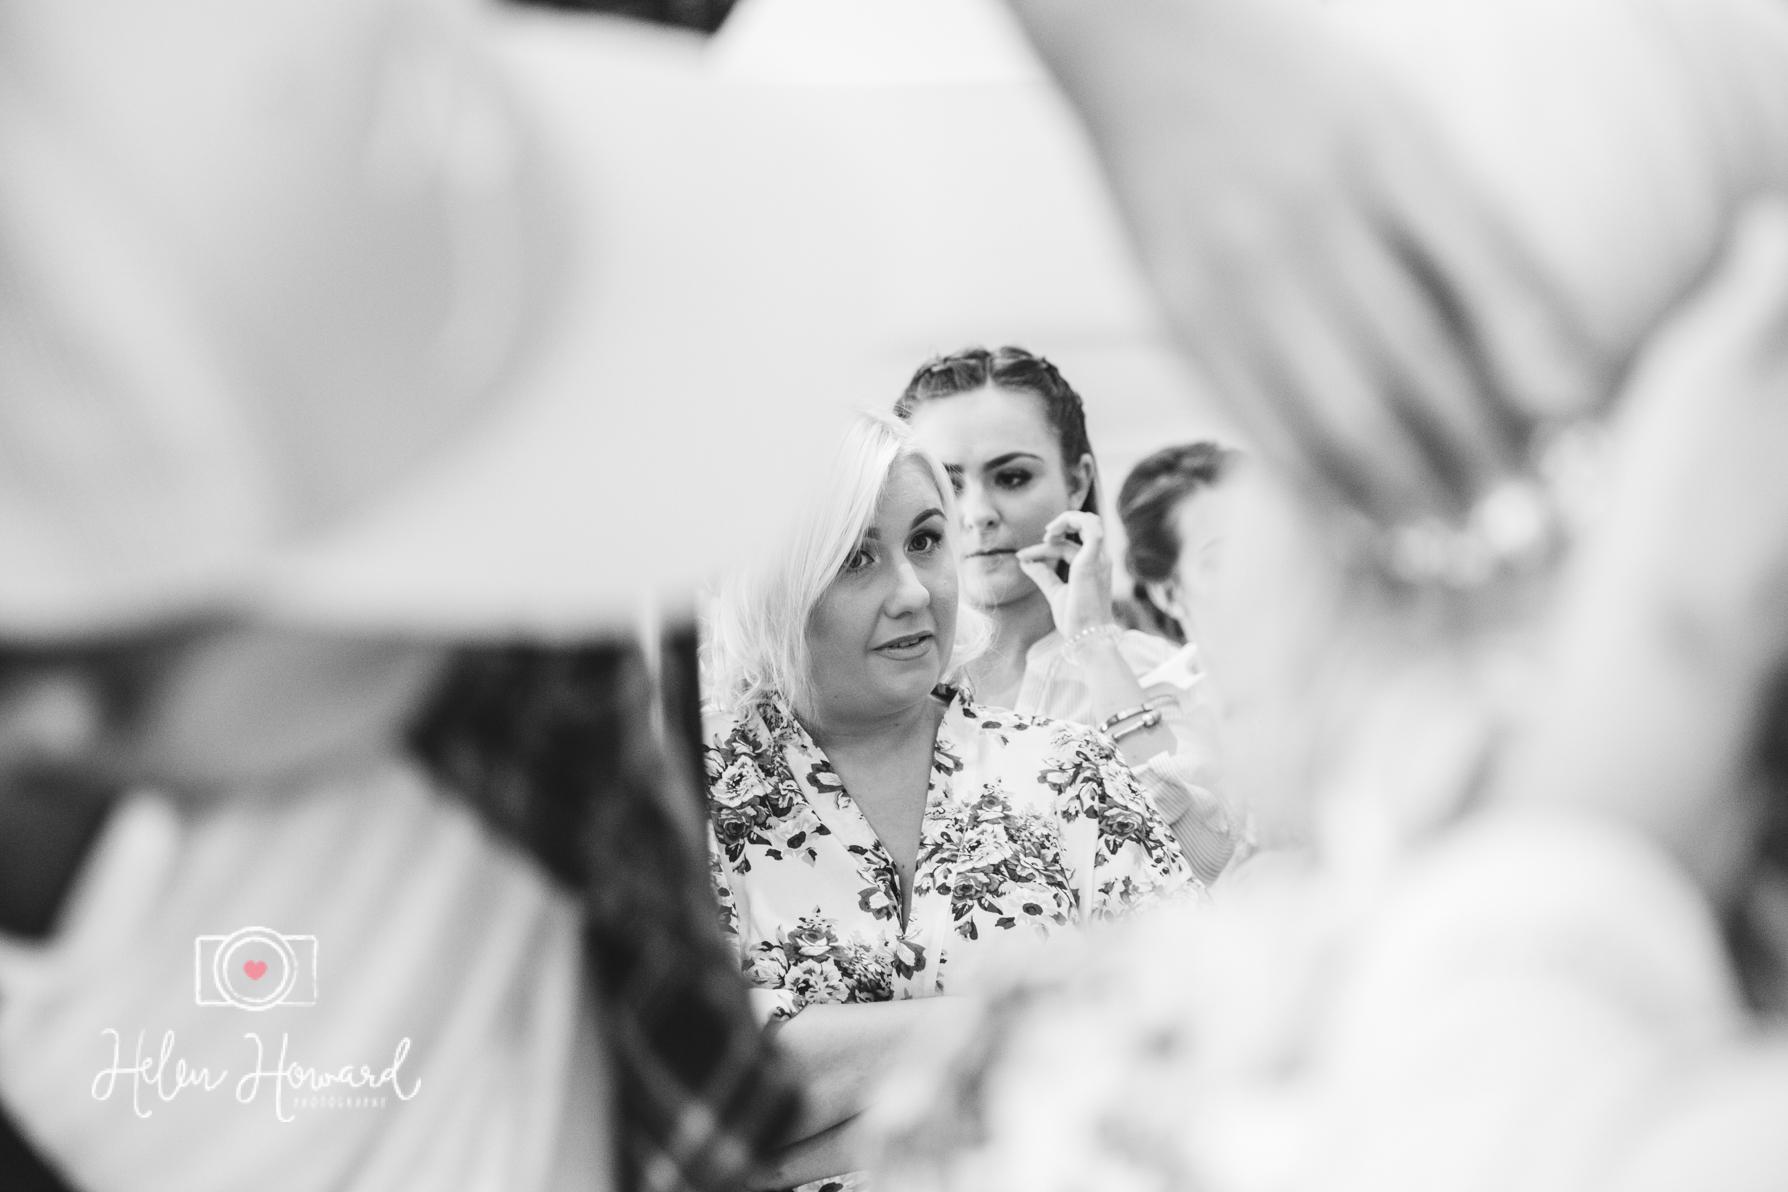 Shustoke Farm Barns Wedding Photography by Helen Howard-7.jpg